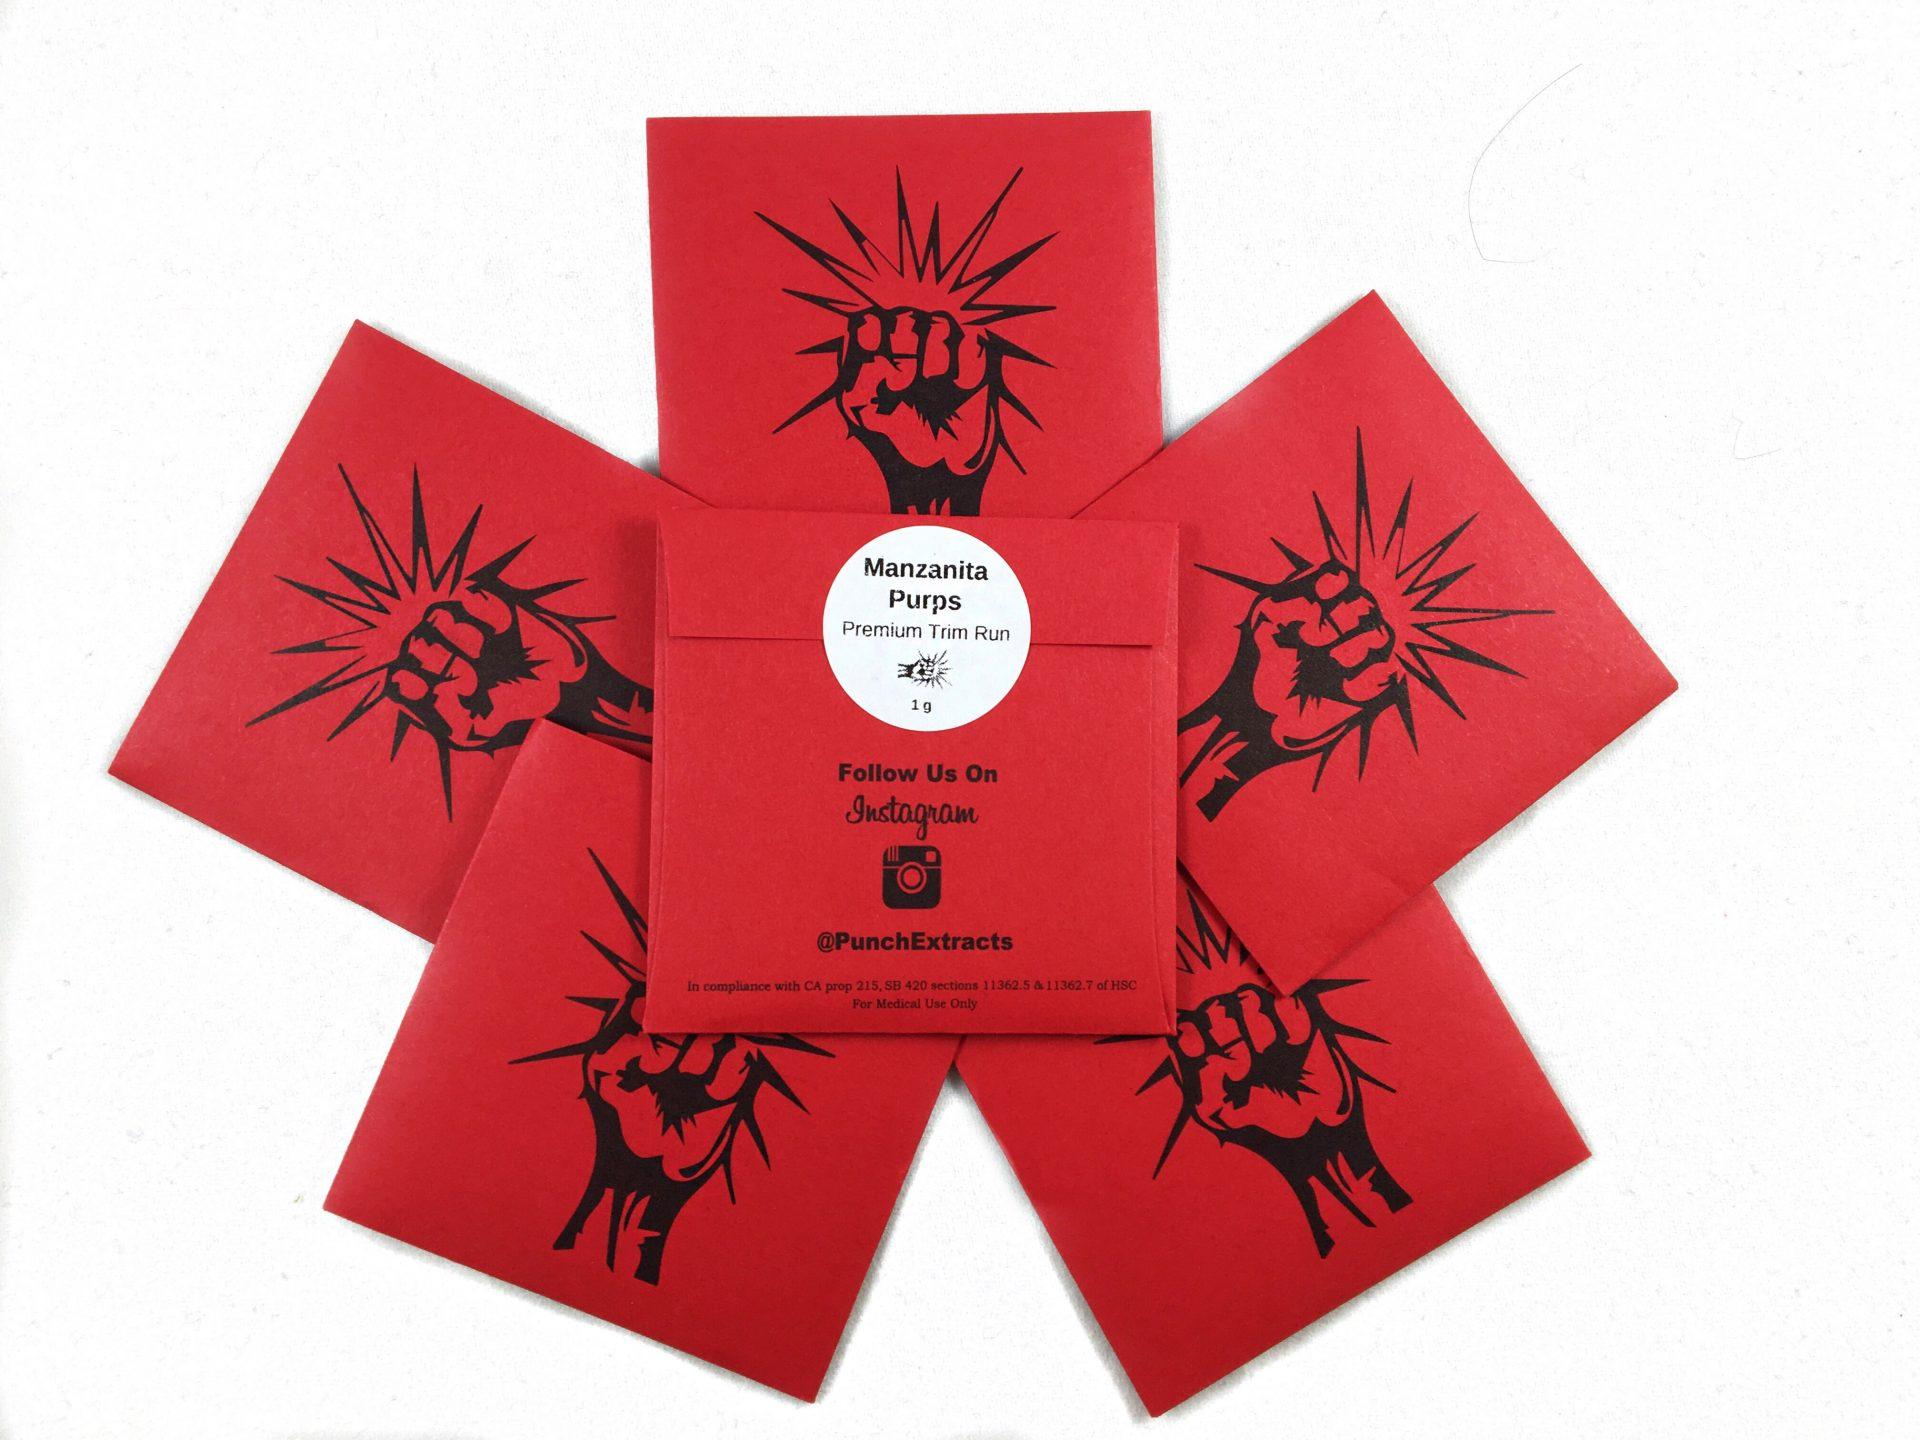 menu wax extracts punchextracts shatter manzanita purps